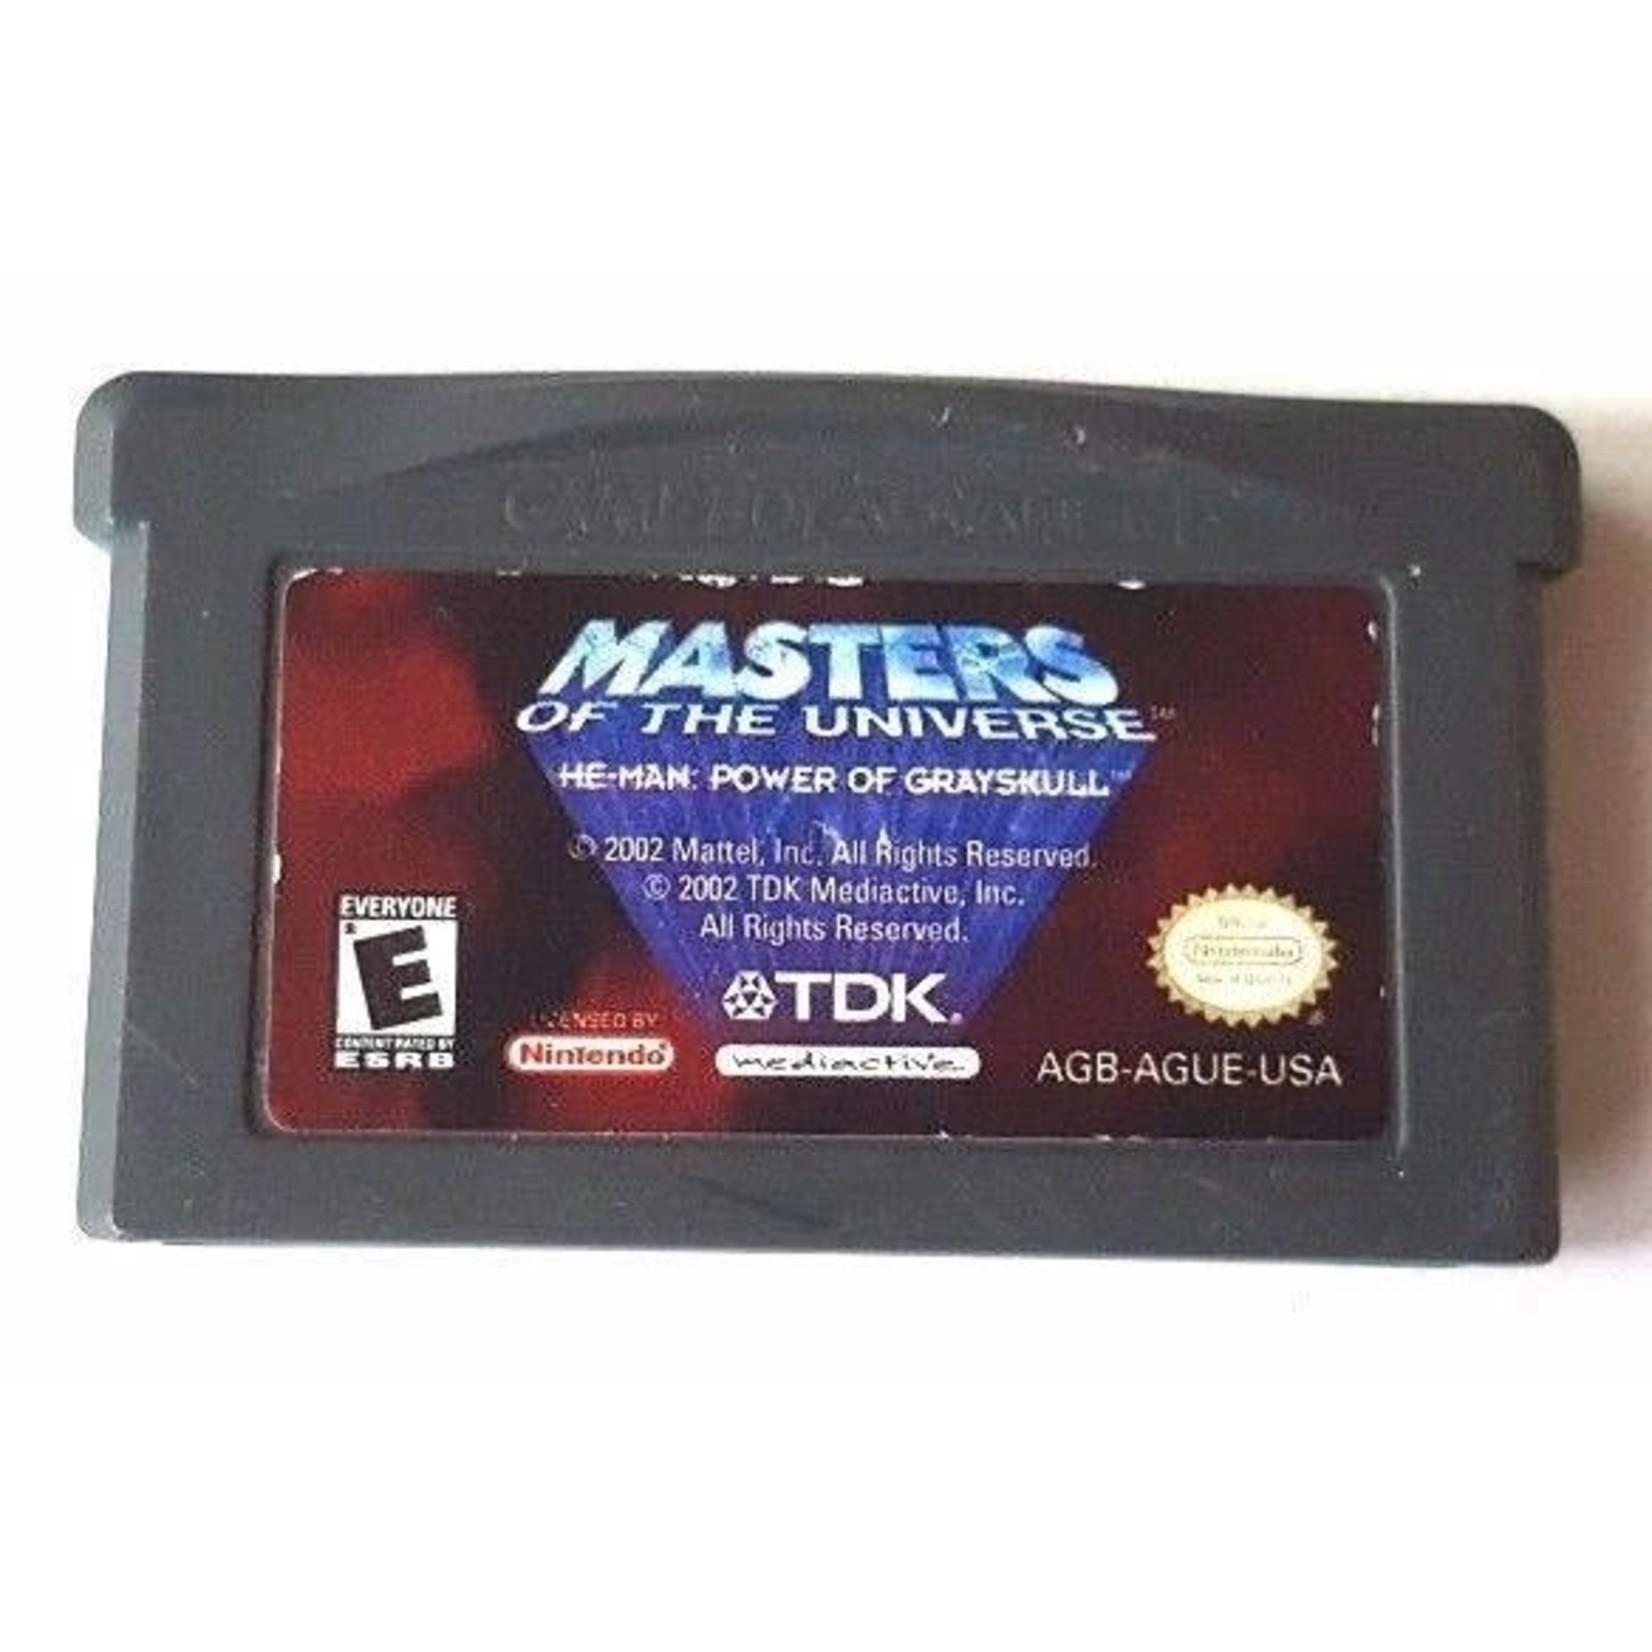 gbau-Masters of the Universe (cartridge)